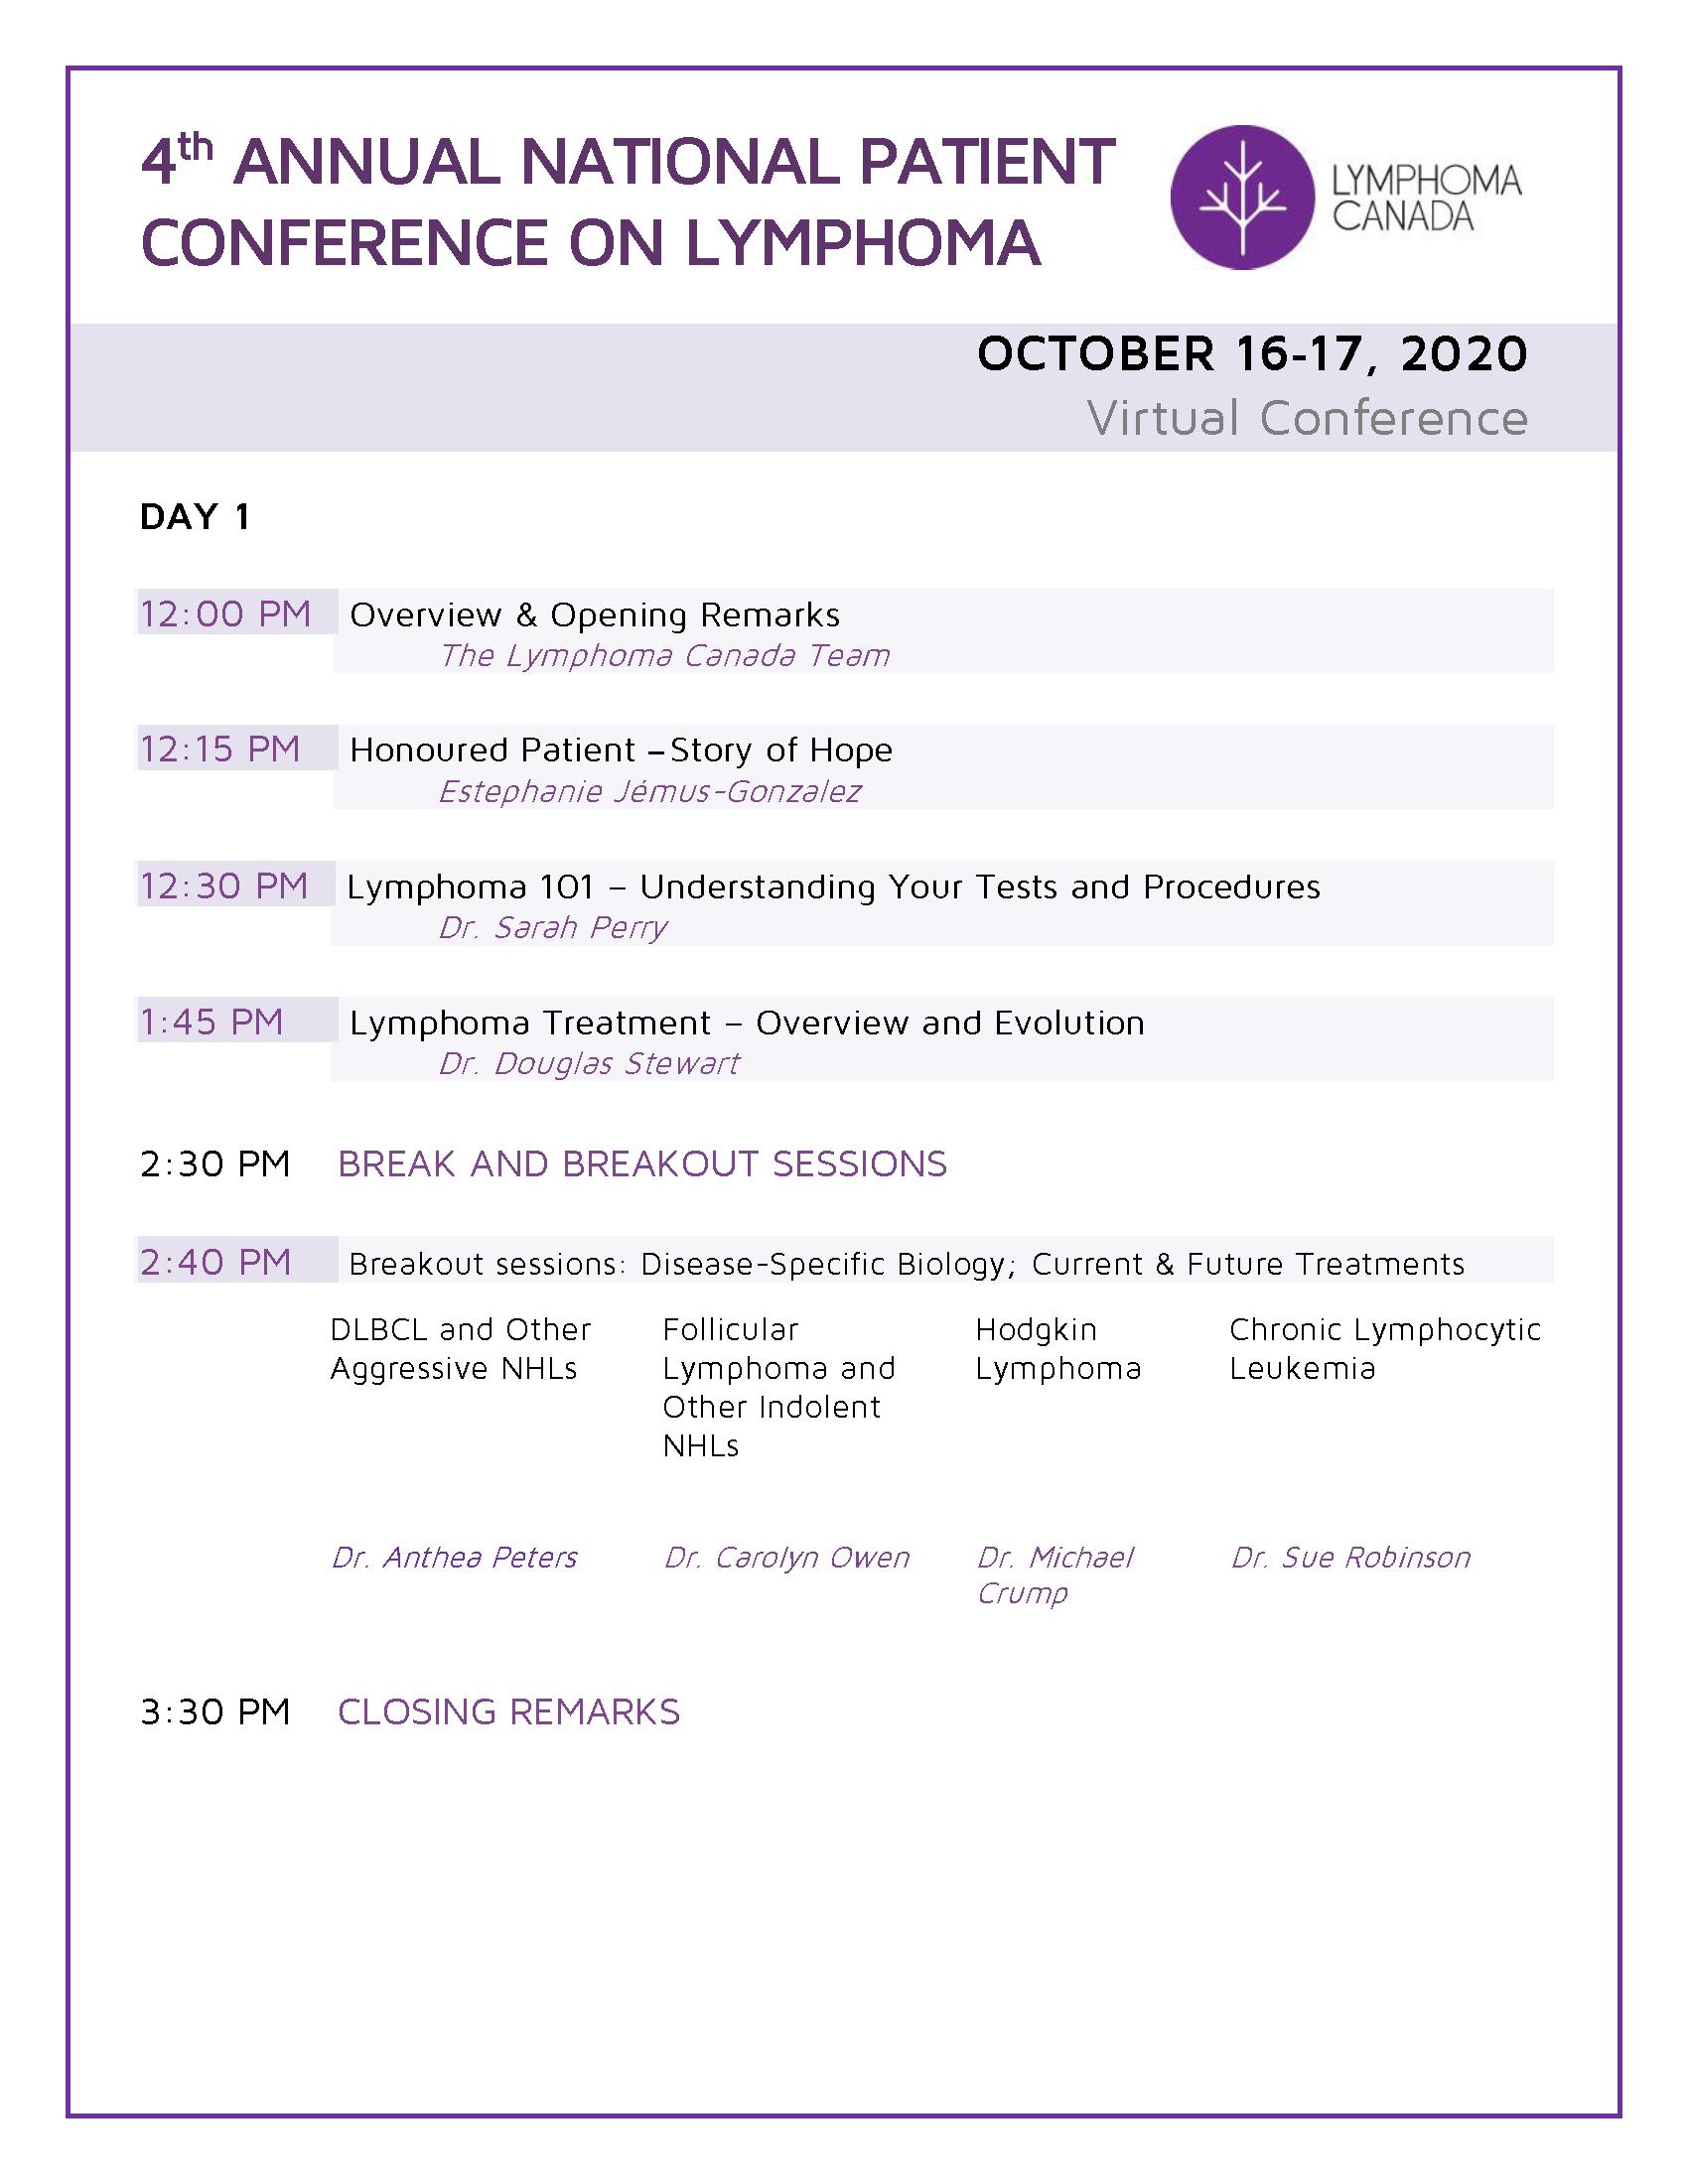 National Conference Agenda